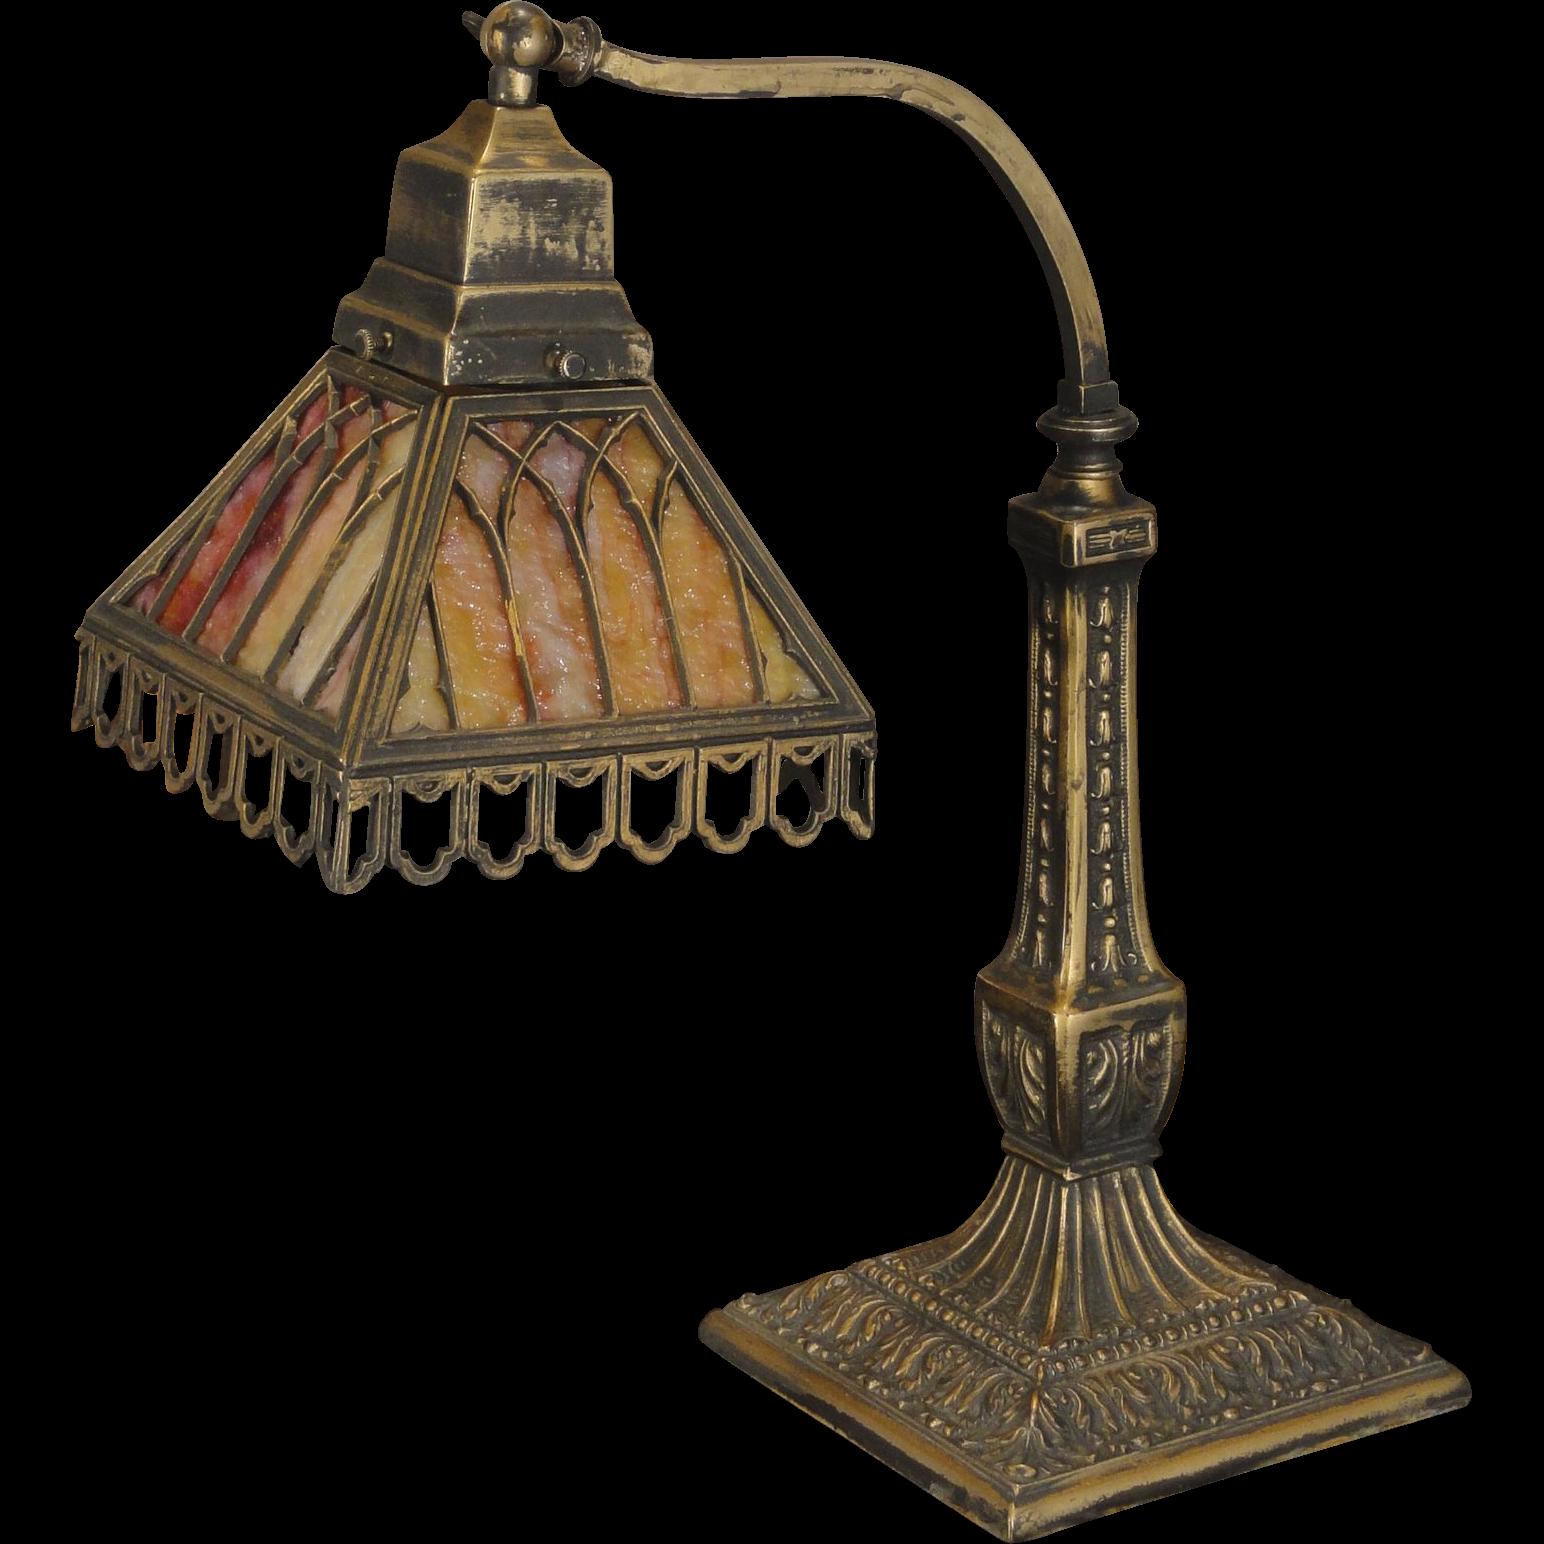 Pittsburgh Gothic Slag Glass Desk Lamp From Rubylane Sold